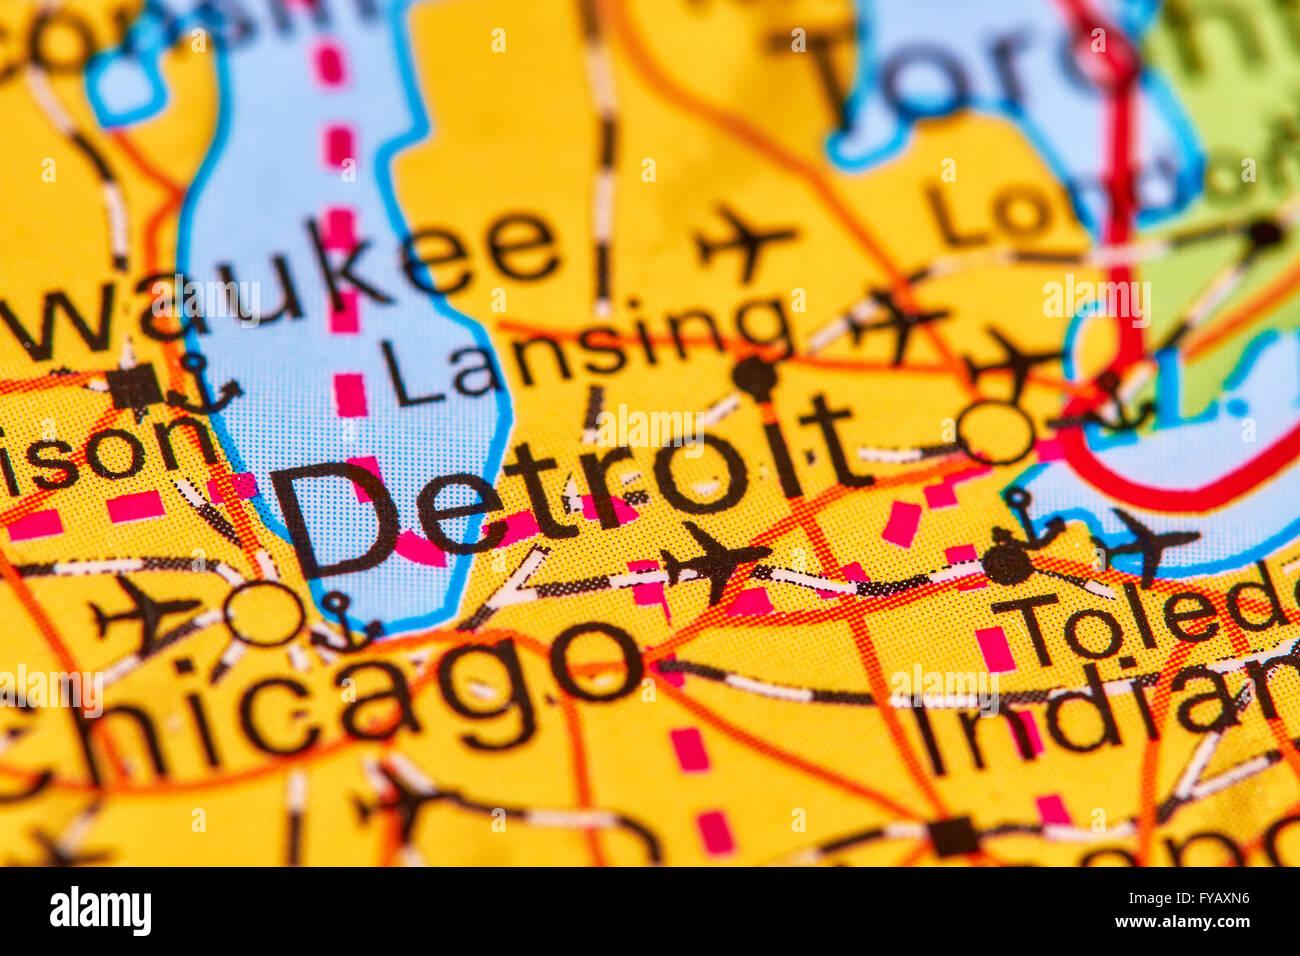 Detroit, City in USA on the World Map Stock Photo: 102888050 ... on map usa dallas, map usa indianapolis, map usa new orleans, map usa san francisco, map usa boston, map usa chicago, map usa san antonio, map usa cleveland, map usa san diego, map usa new york, map usa baltimore, map usa philadelphia, map usa michigan, map usa atlanta,